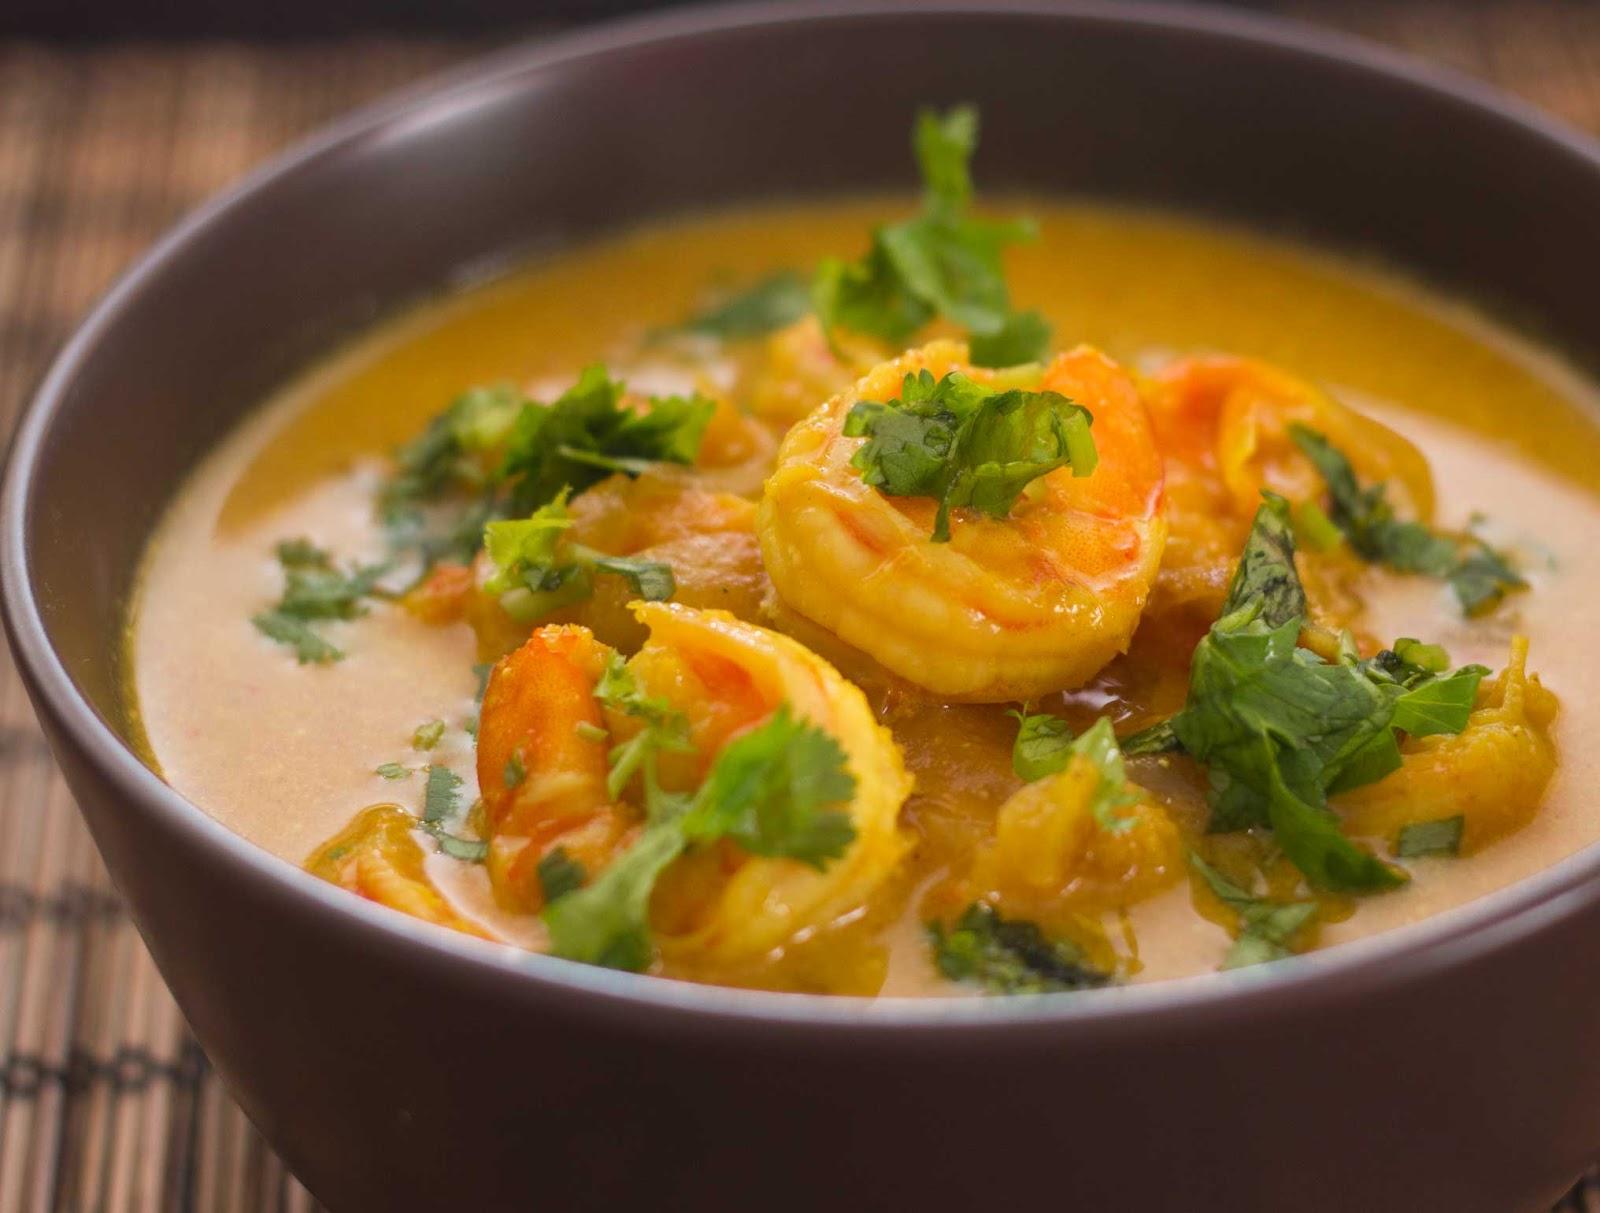 Fabulous friday shrimp curry in coconut milk